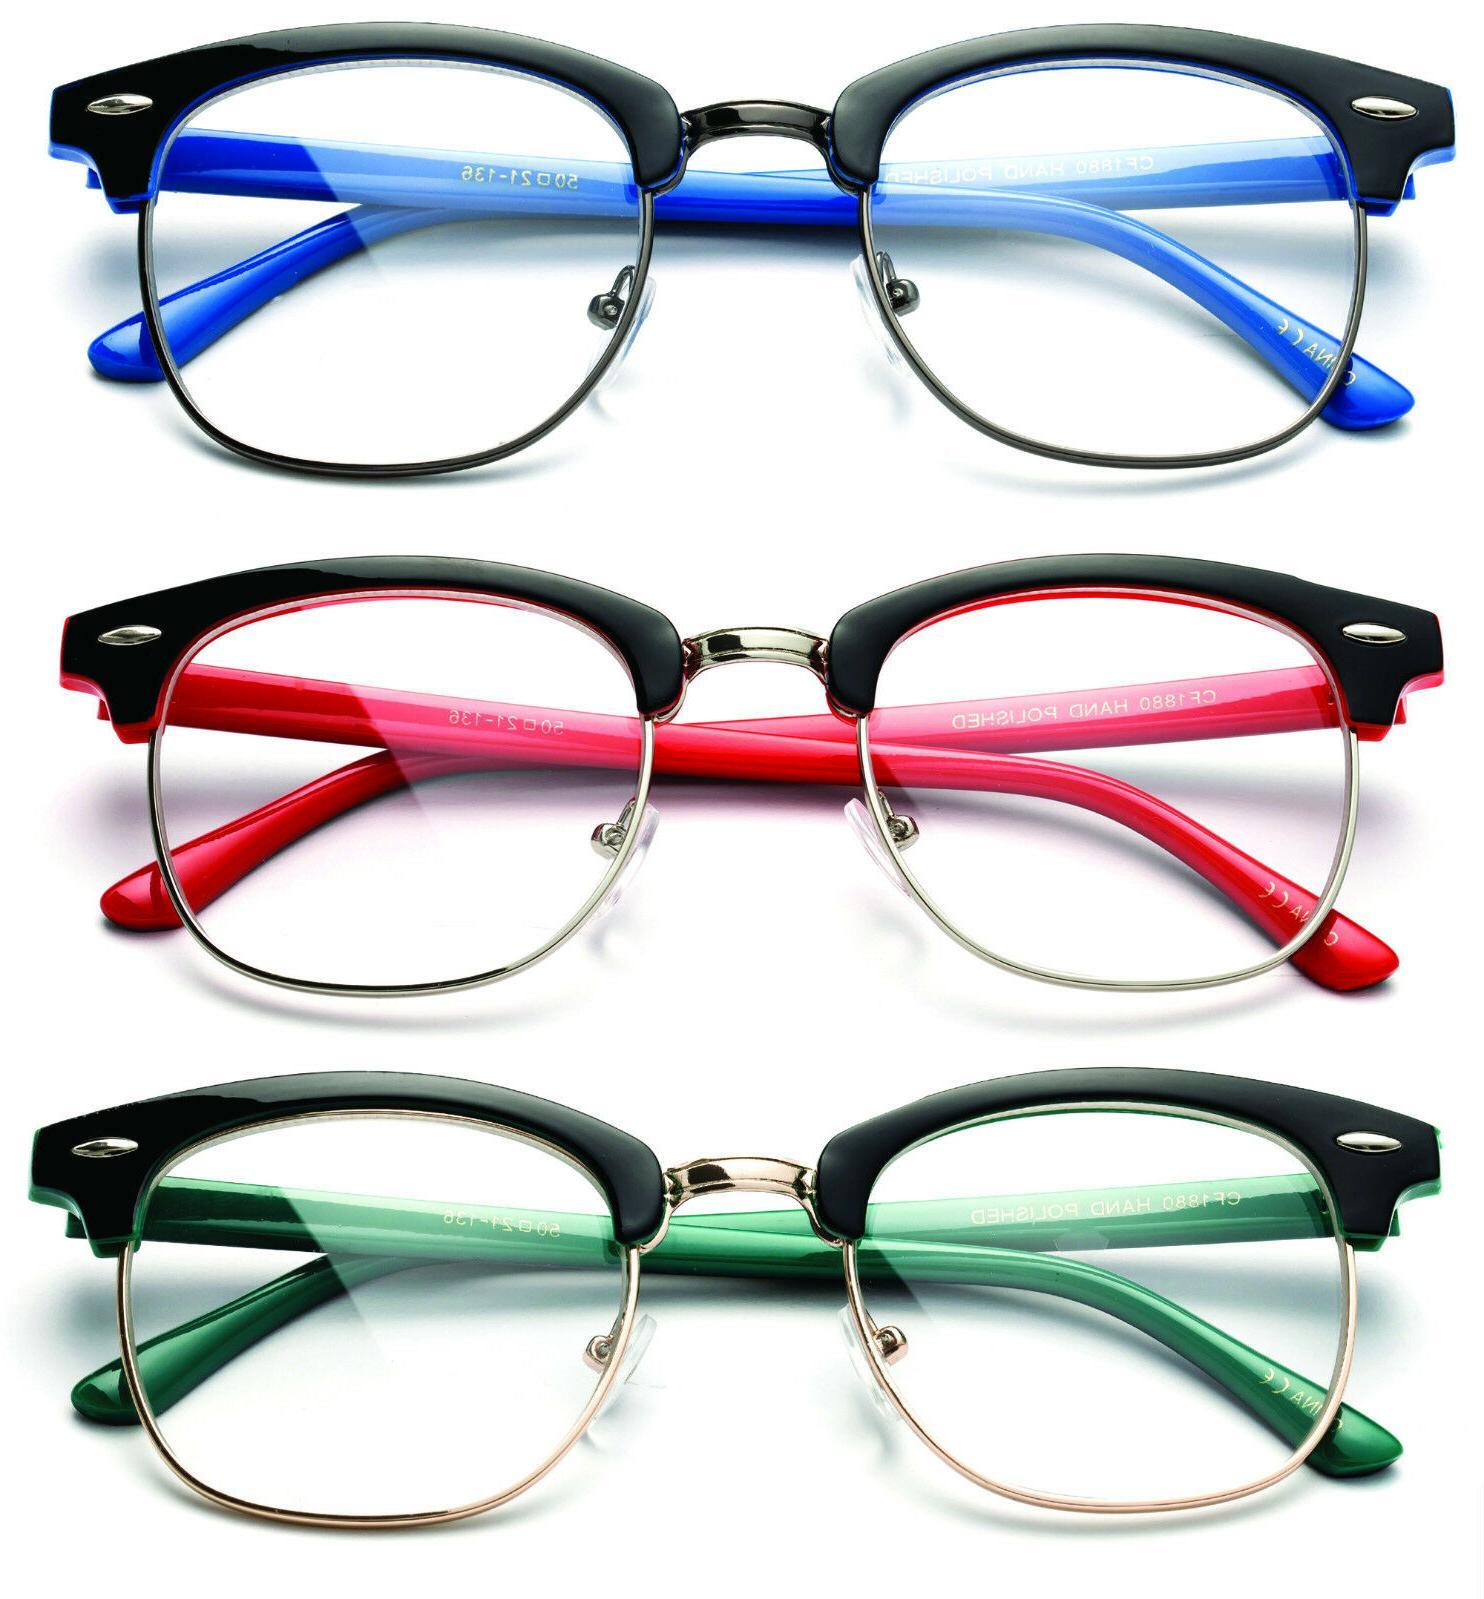 Interview Lens Glasses Nerd Geek 100%